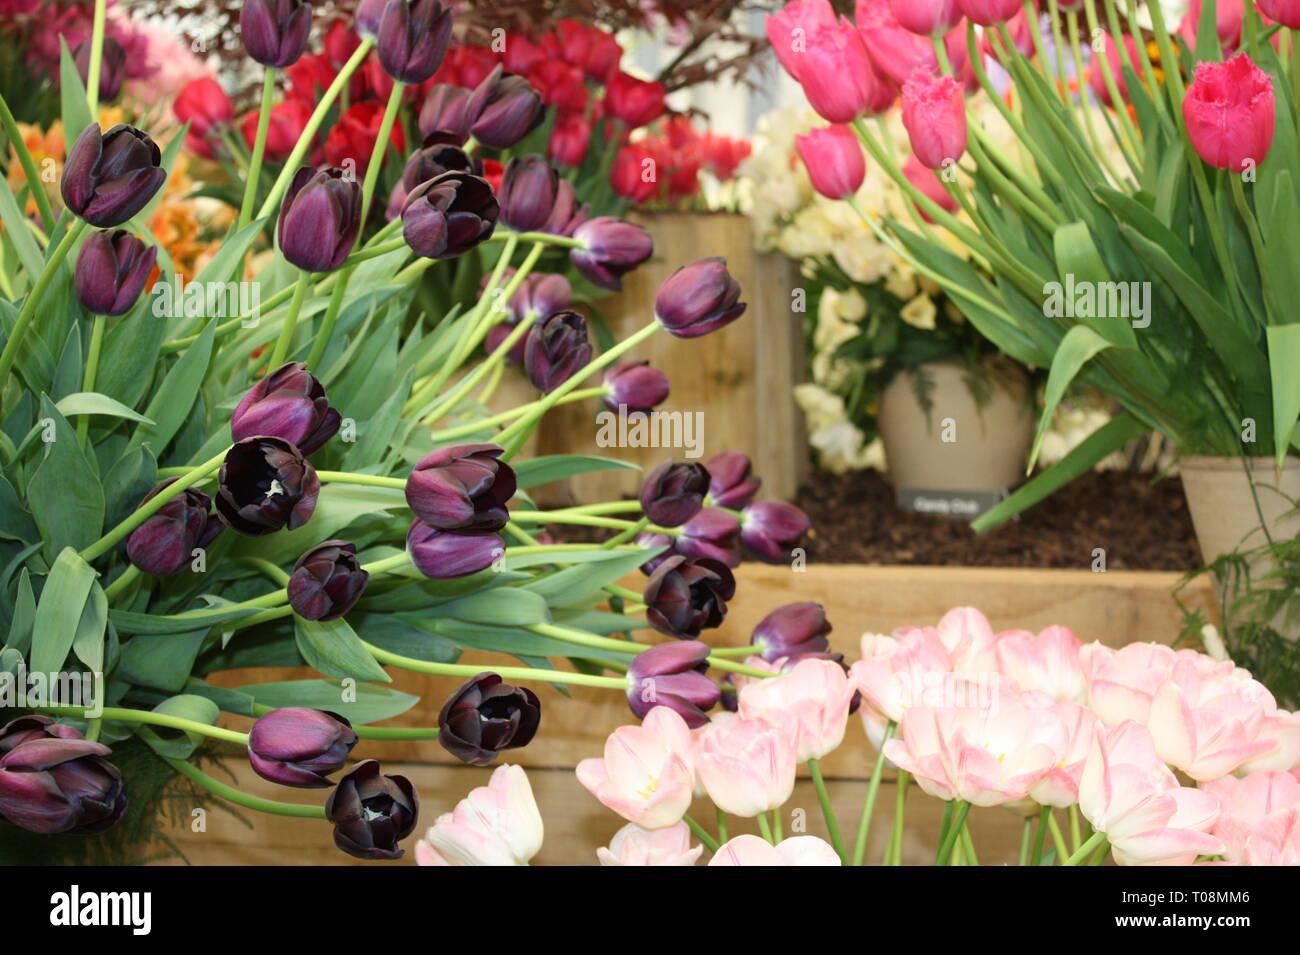 Tulips flowers on display Stock Photo